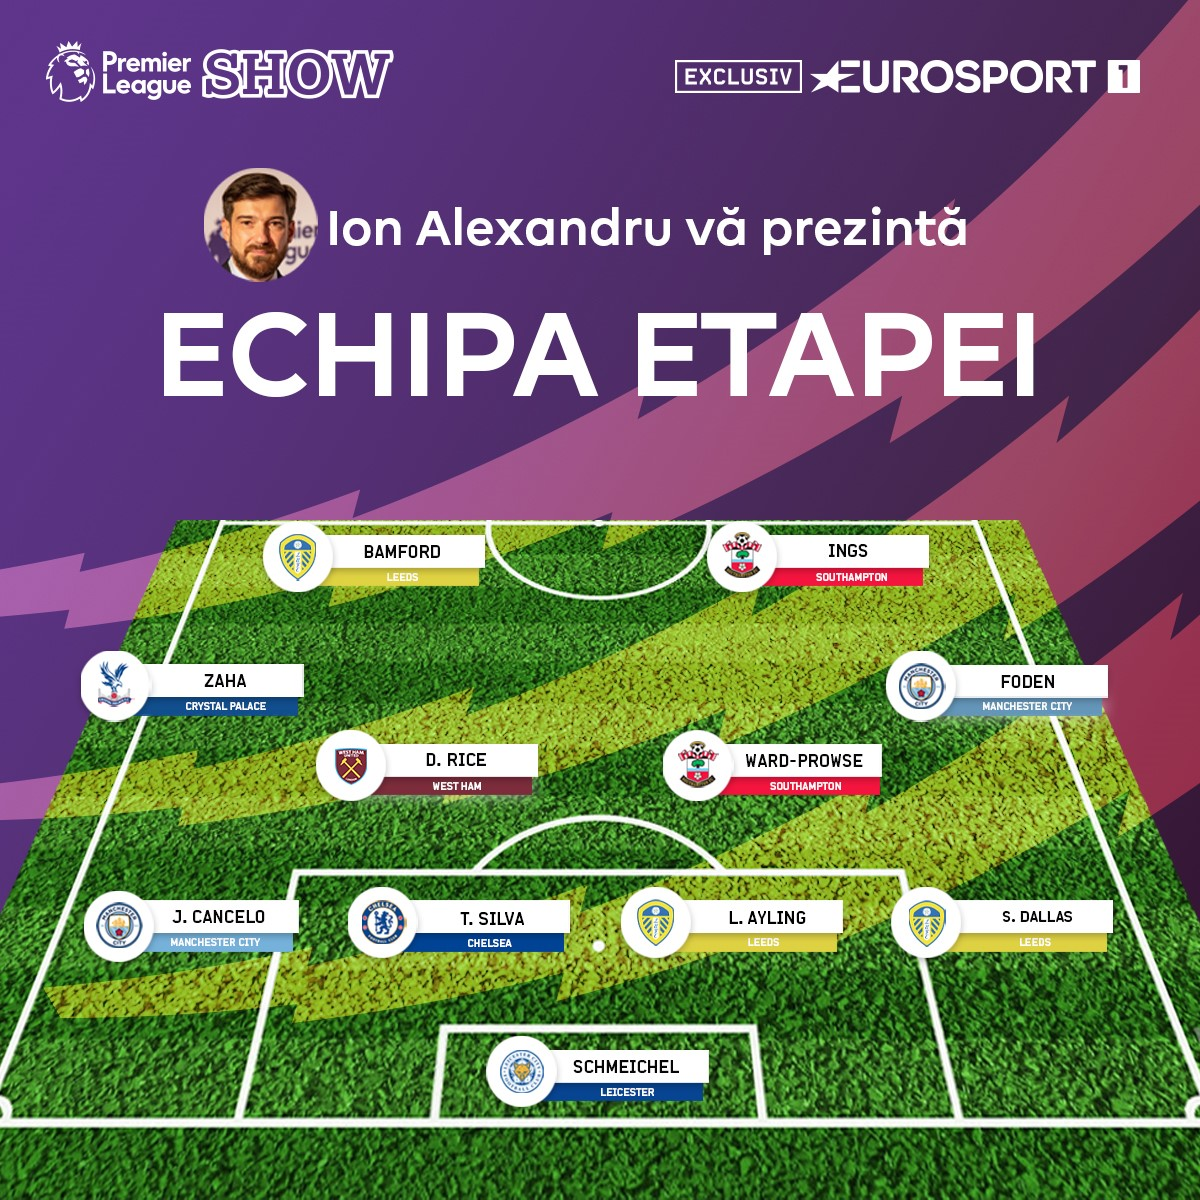 https://i.eurosport.com/2020/10/27/2923173.jpg